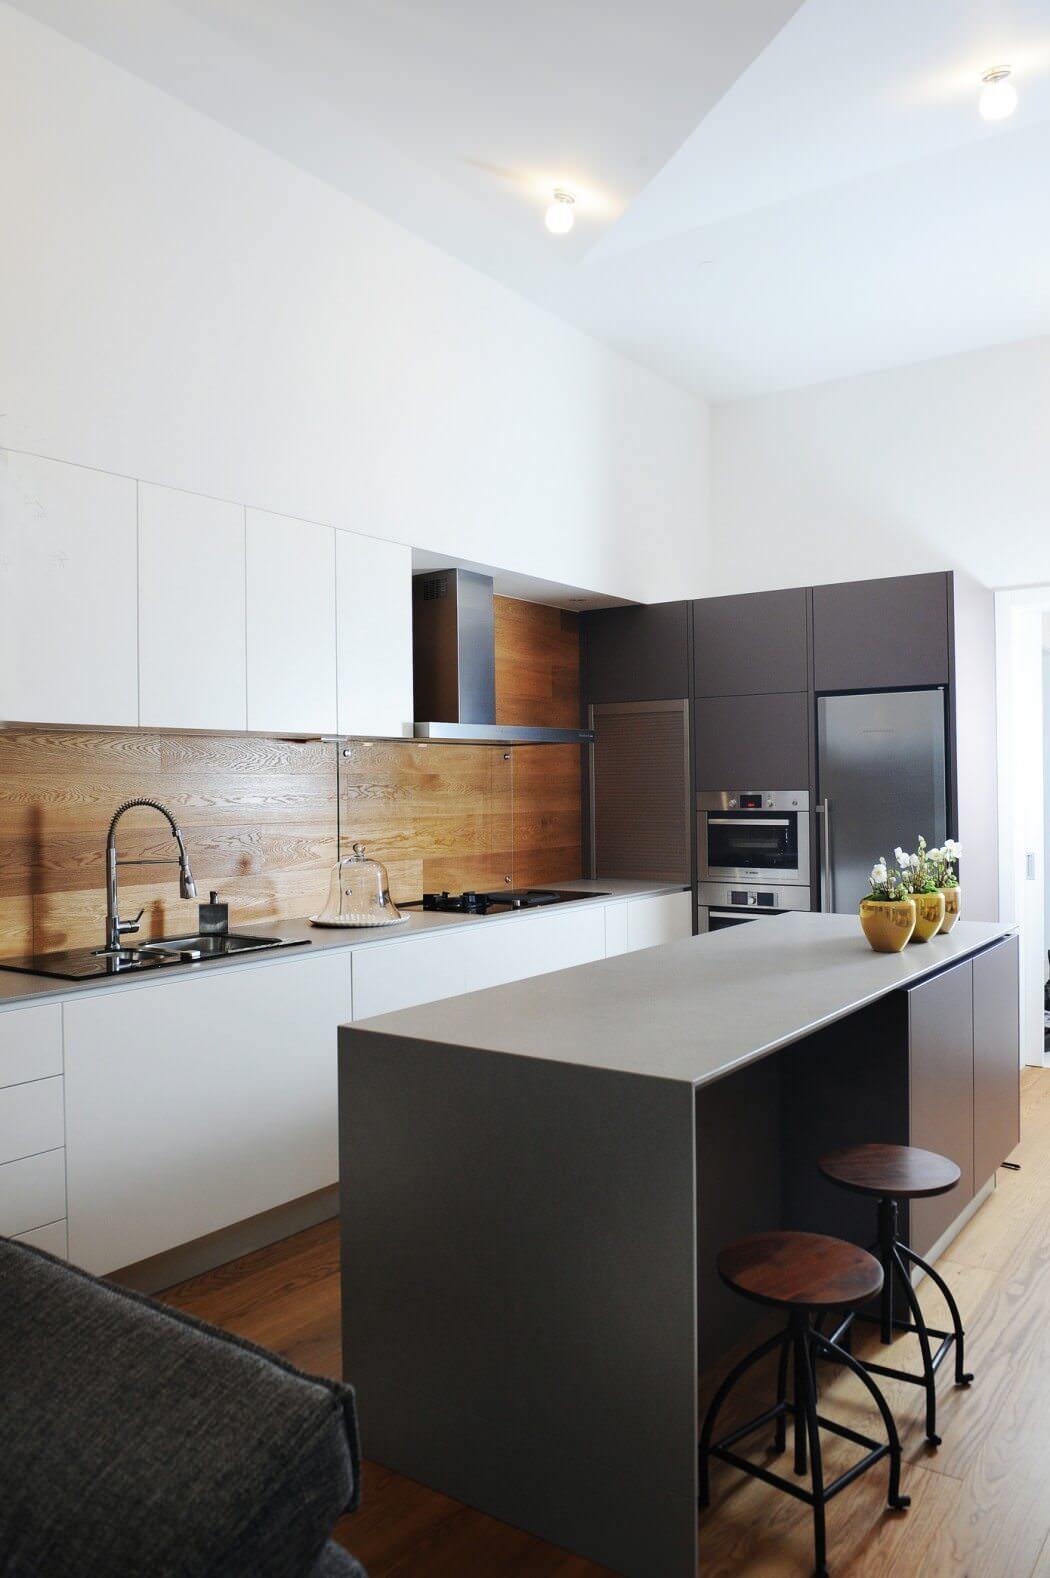 Cucina Moderna Legno Chiaro | 100 Idee Cucine Moderne In Legno ...